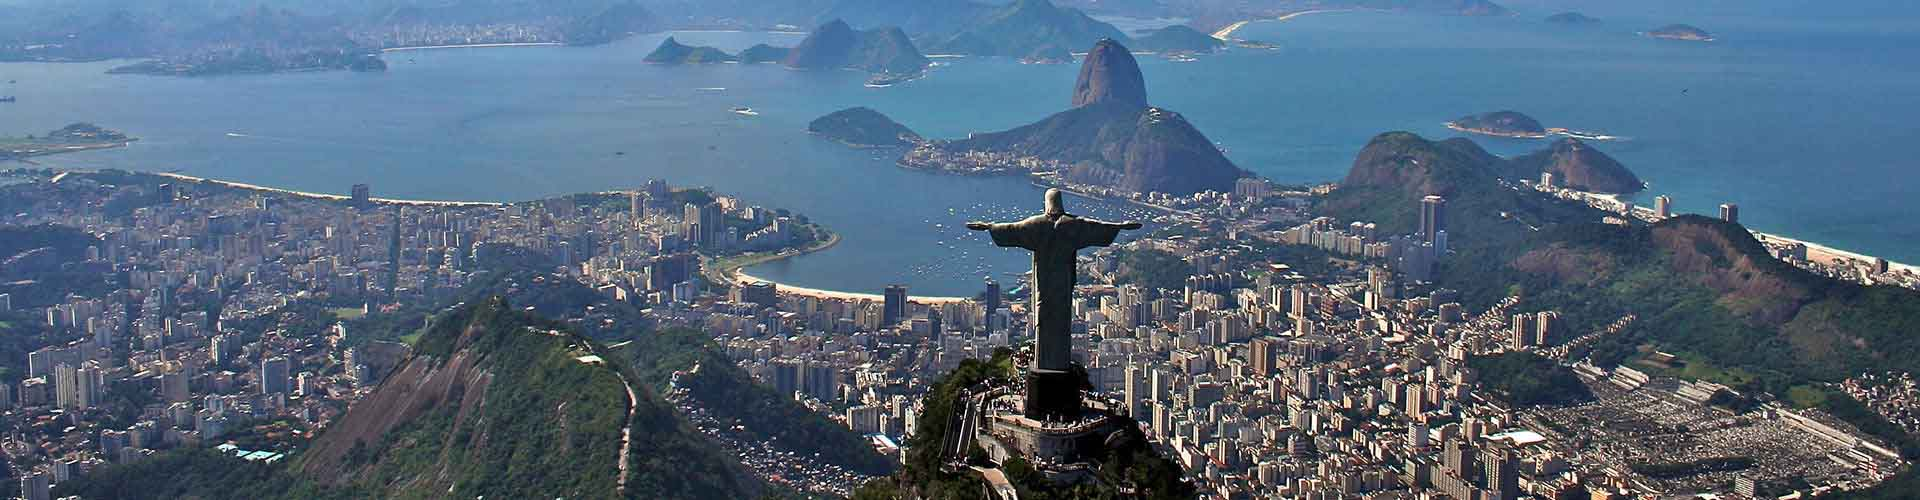 Río de Janeiro - Albergues Juveniles en el distrito Santa Teresa . Mapas de Río de Janeiro, Fotos y Comentarios para cada Albergue Juvenil en Río de Janeiro.